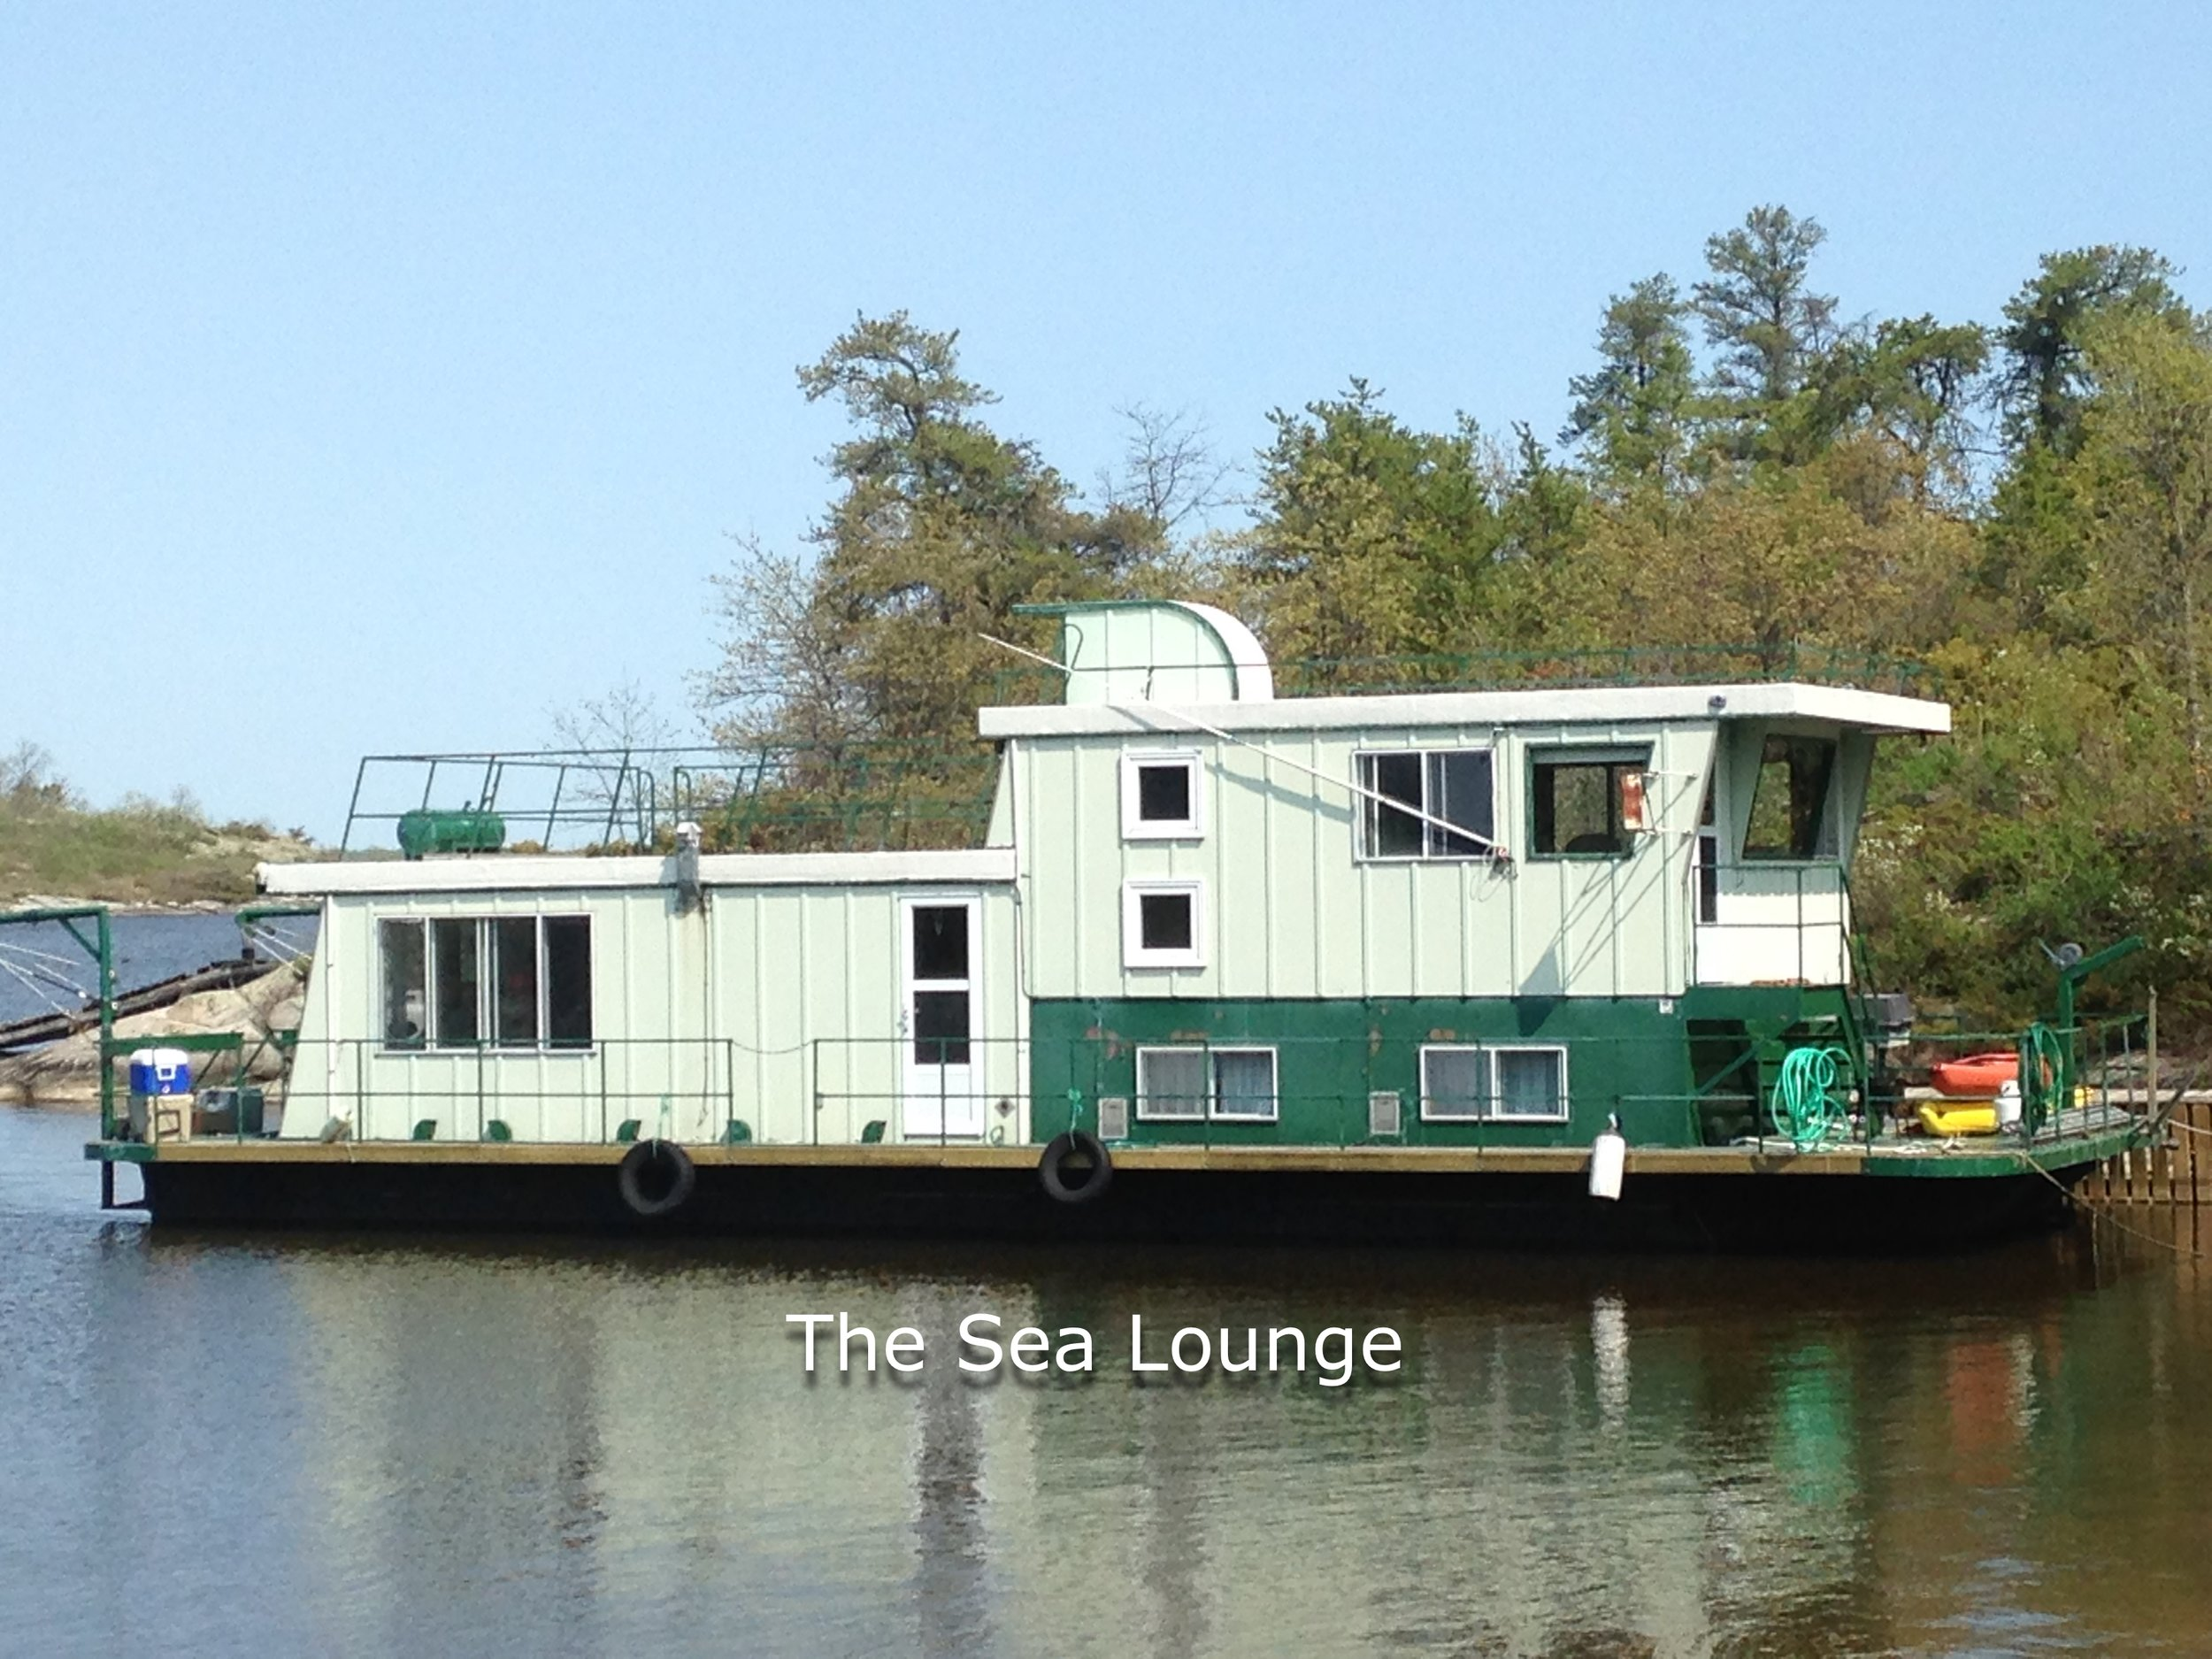 the sea lounge bvr.jpg